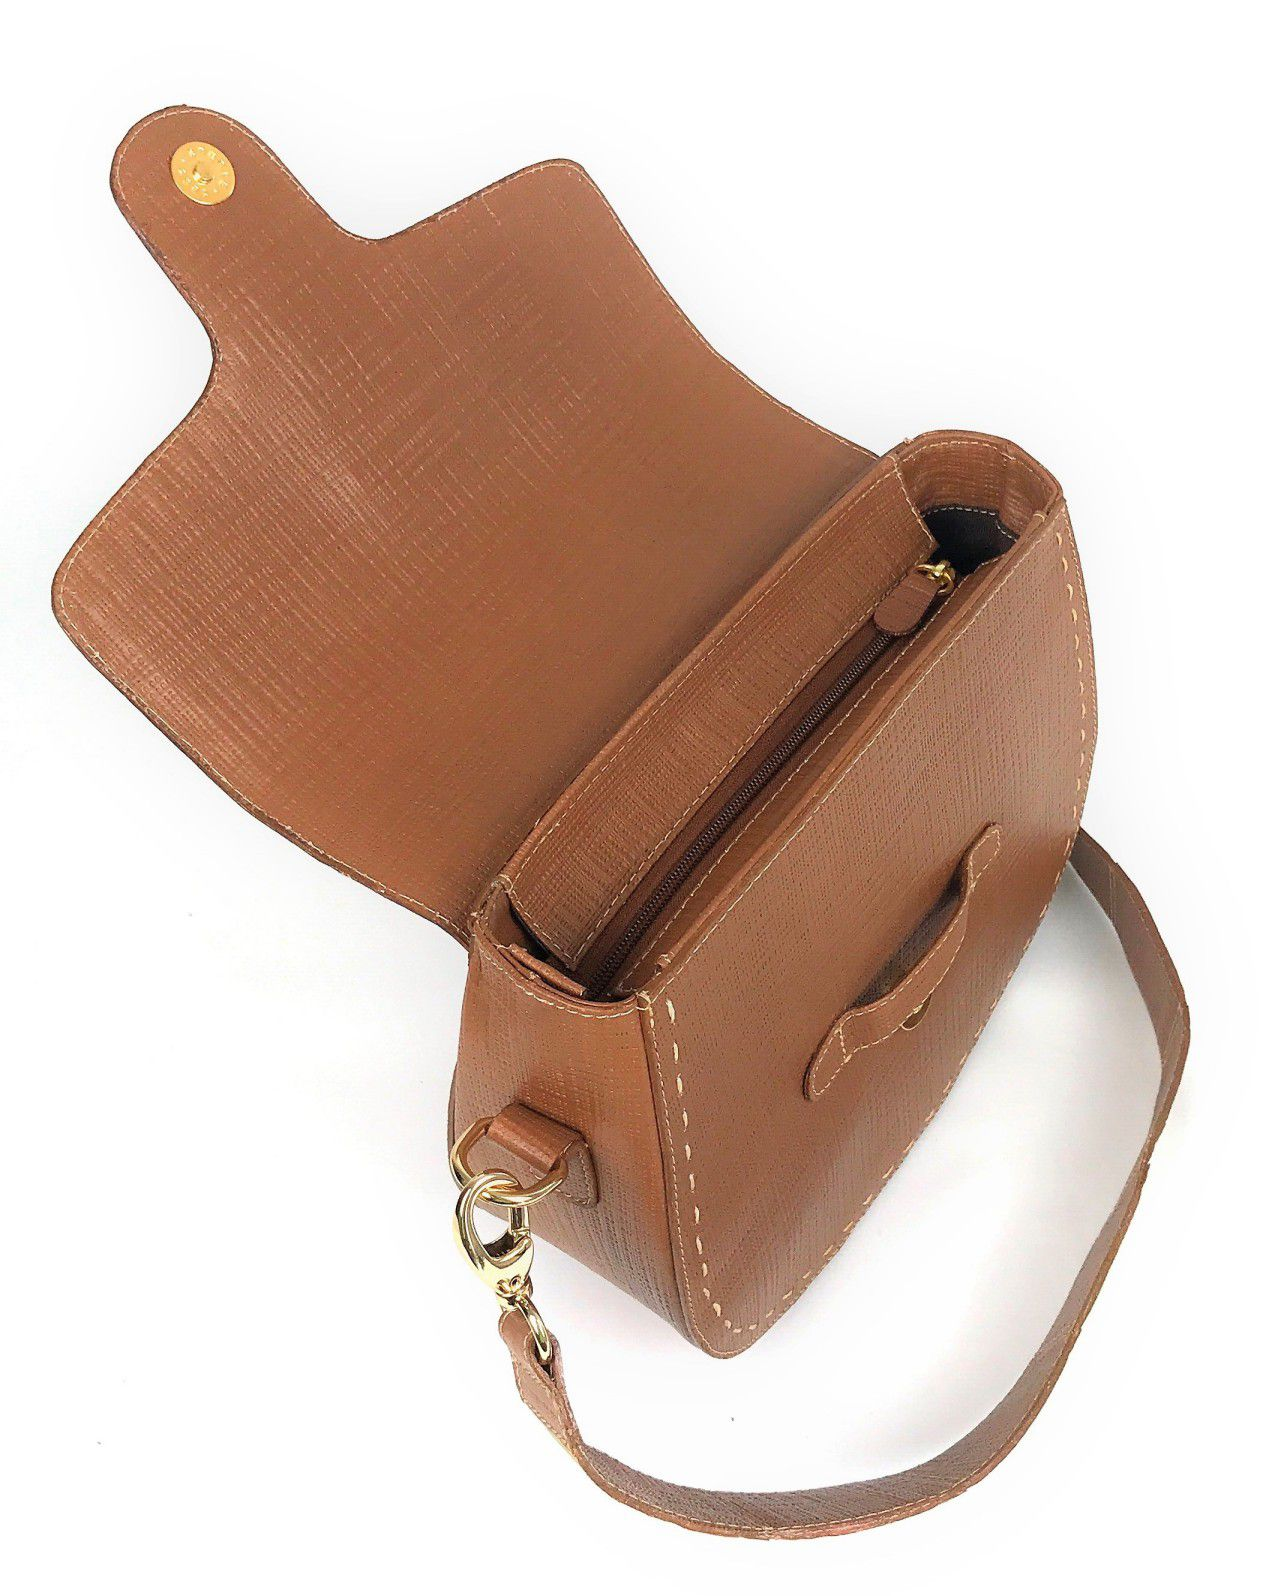 Bolsa Box Feminina de Couro Marrom Bambu HB637 | HAMISH